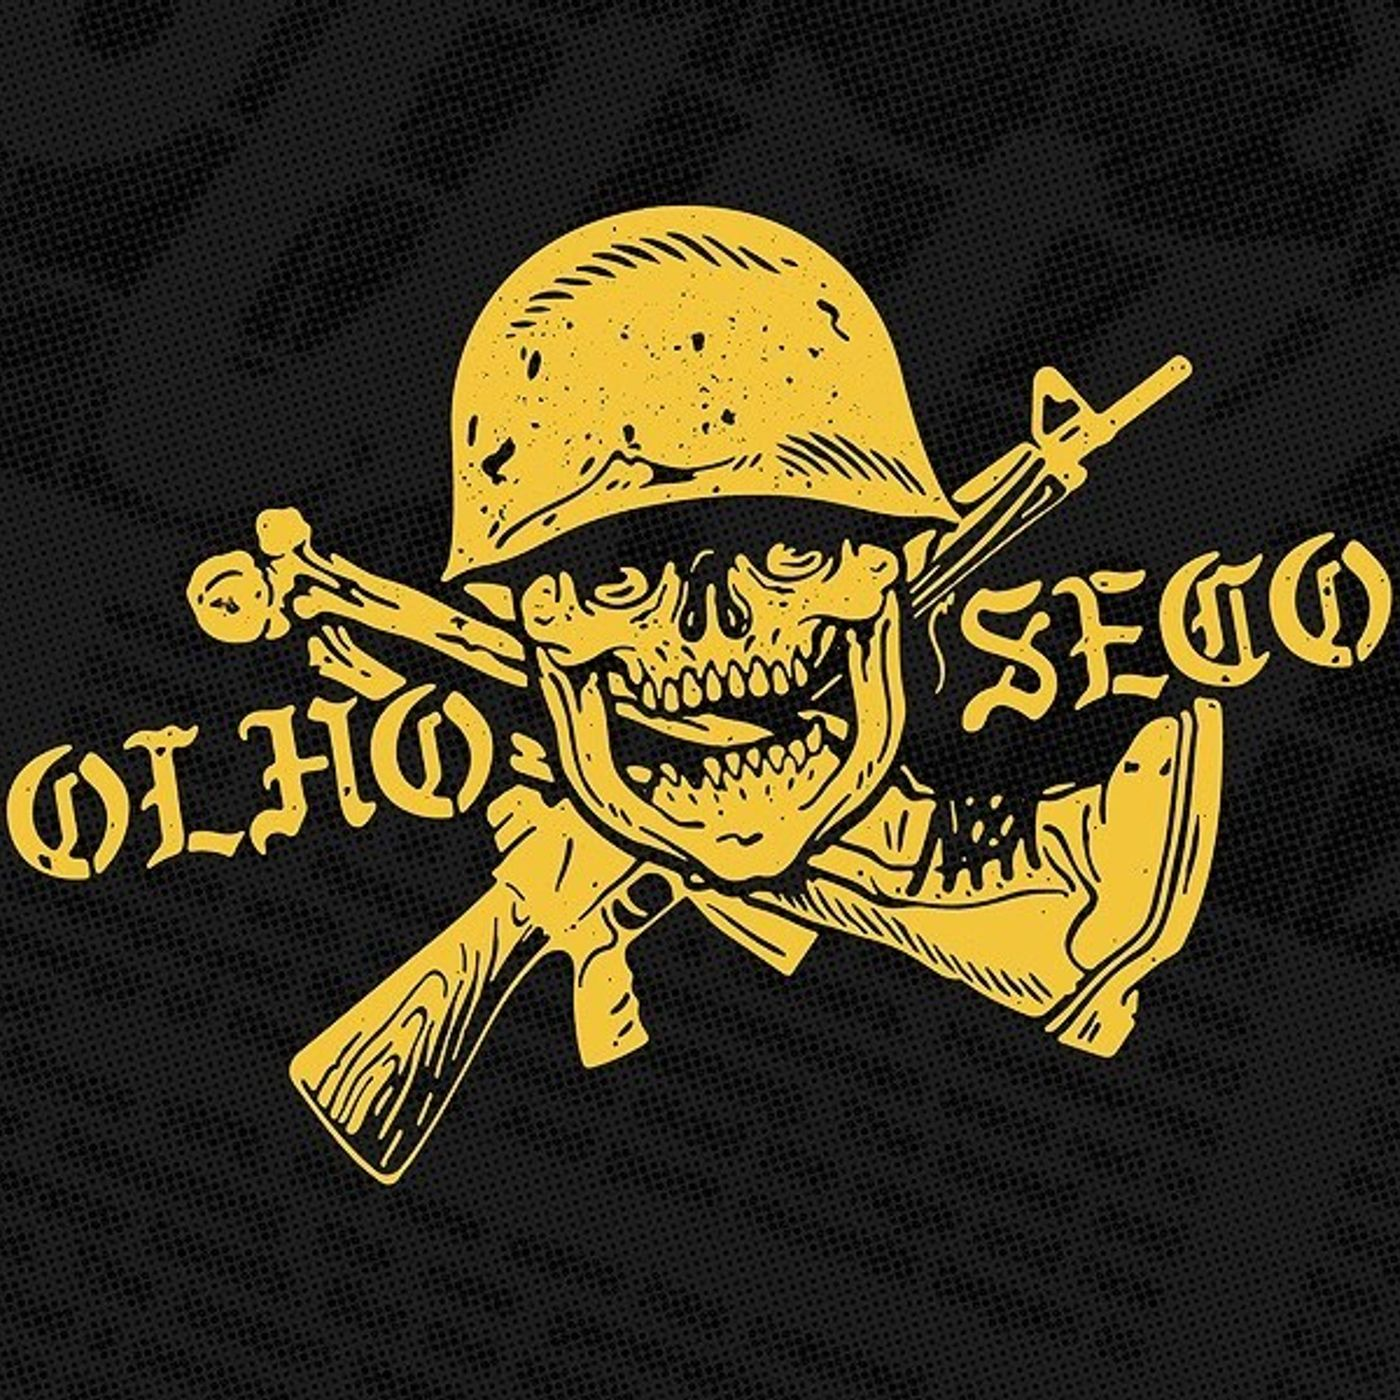 BEST OF ROCK BR voz do Brasil podcast #0394A #OlhoSeco #TWD #stayhome #wearamask #washyourhands #Loki #f9 #xbox #redguardian #melina